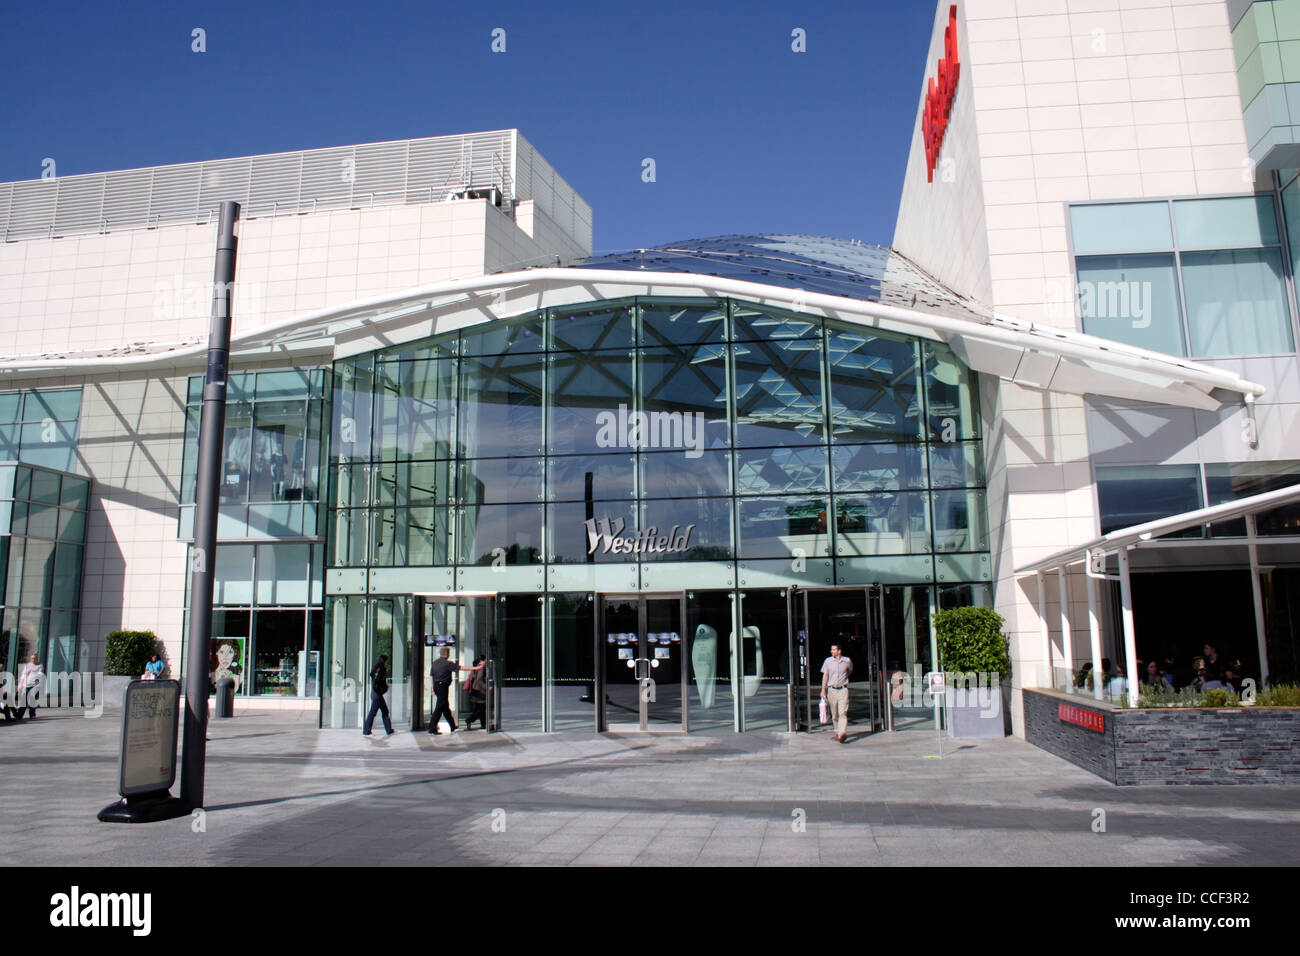 Entrance to Westfield Shopping Centre Shepherds Bush London - Stock Image